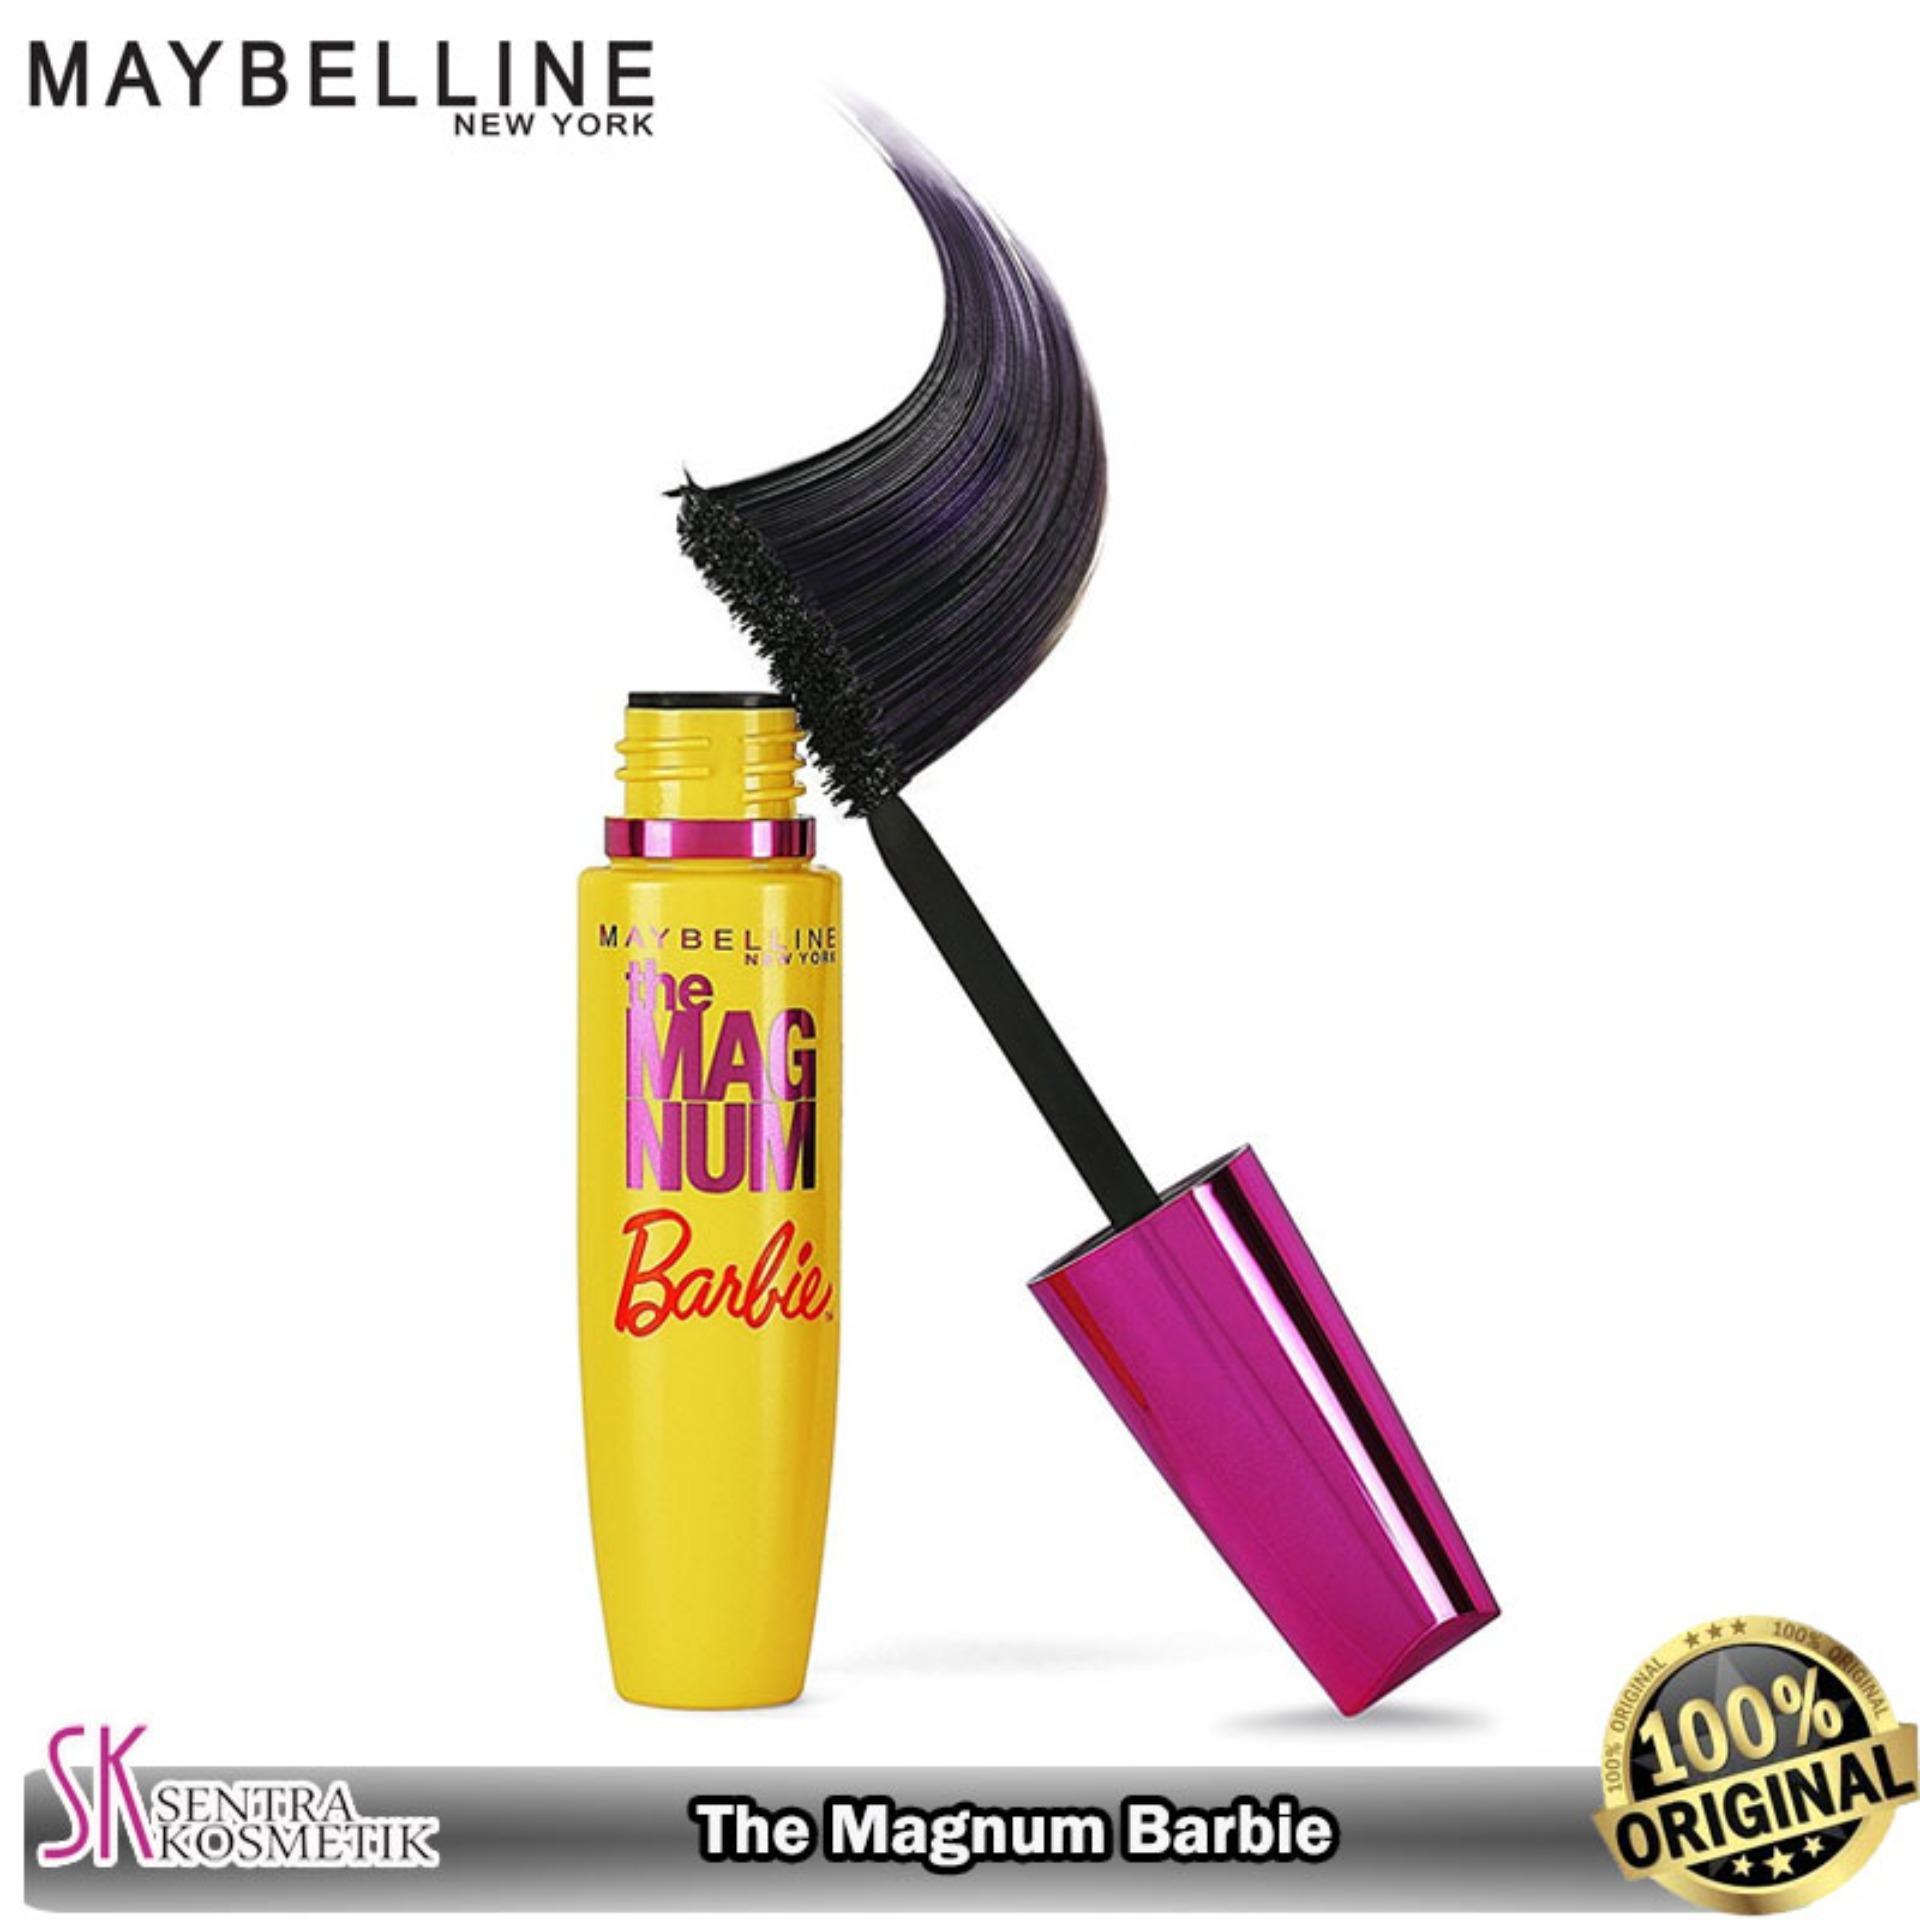 MAYBELLINE The Magnum BARBIE Mascara Waterproof - Hitam